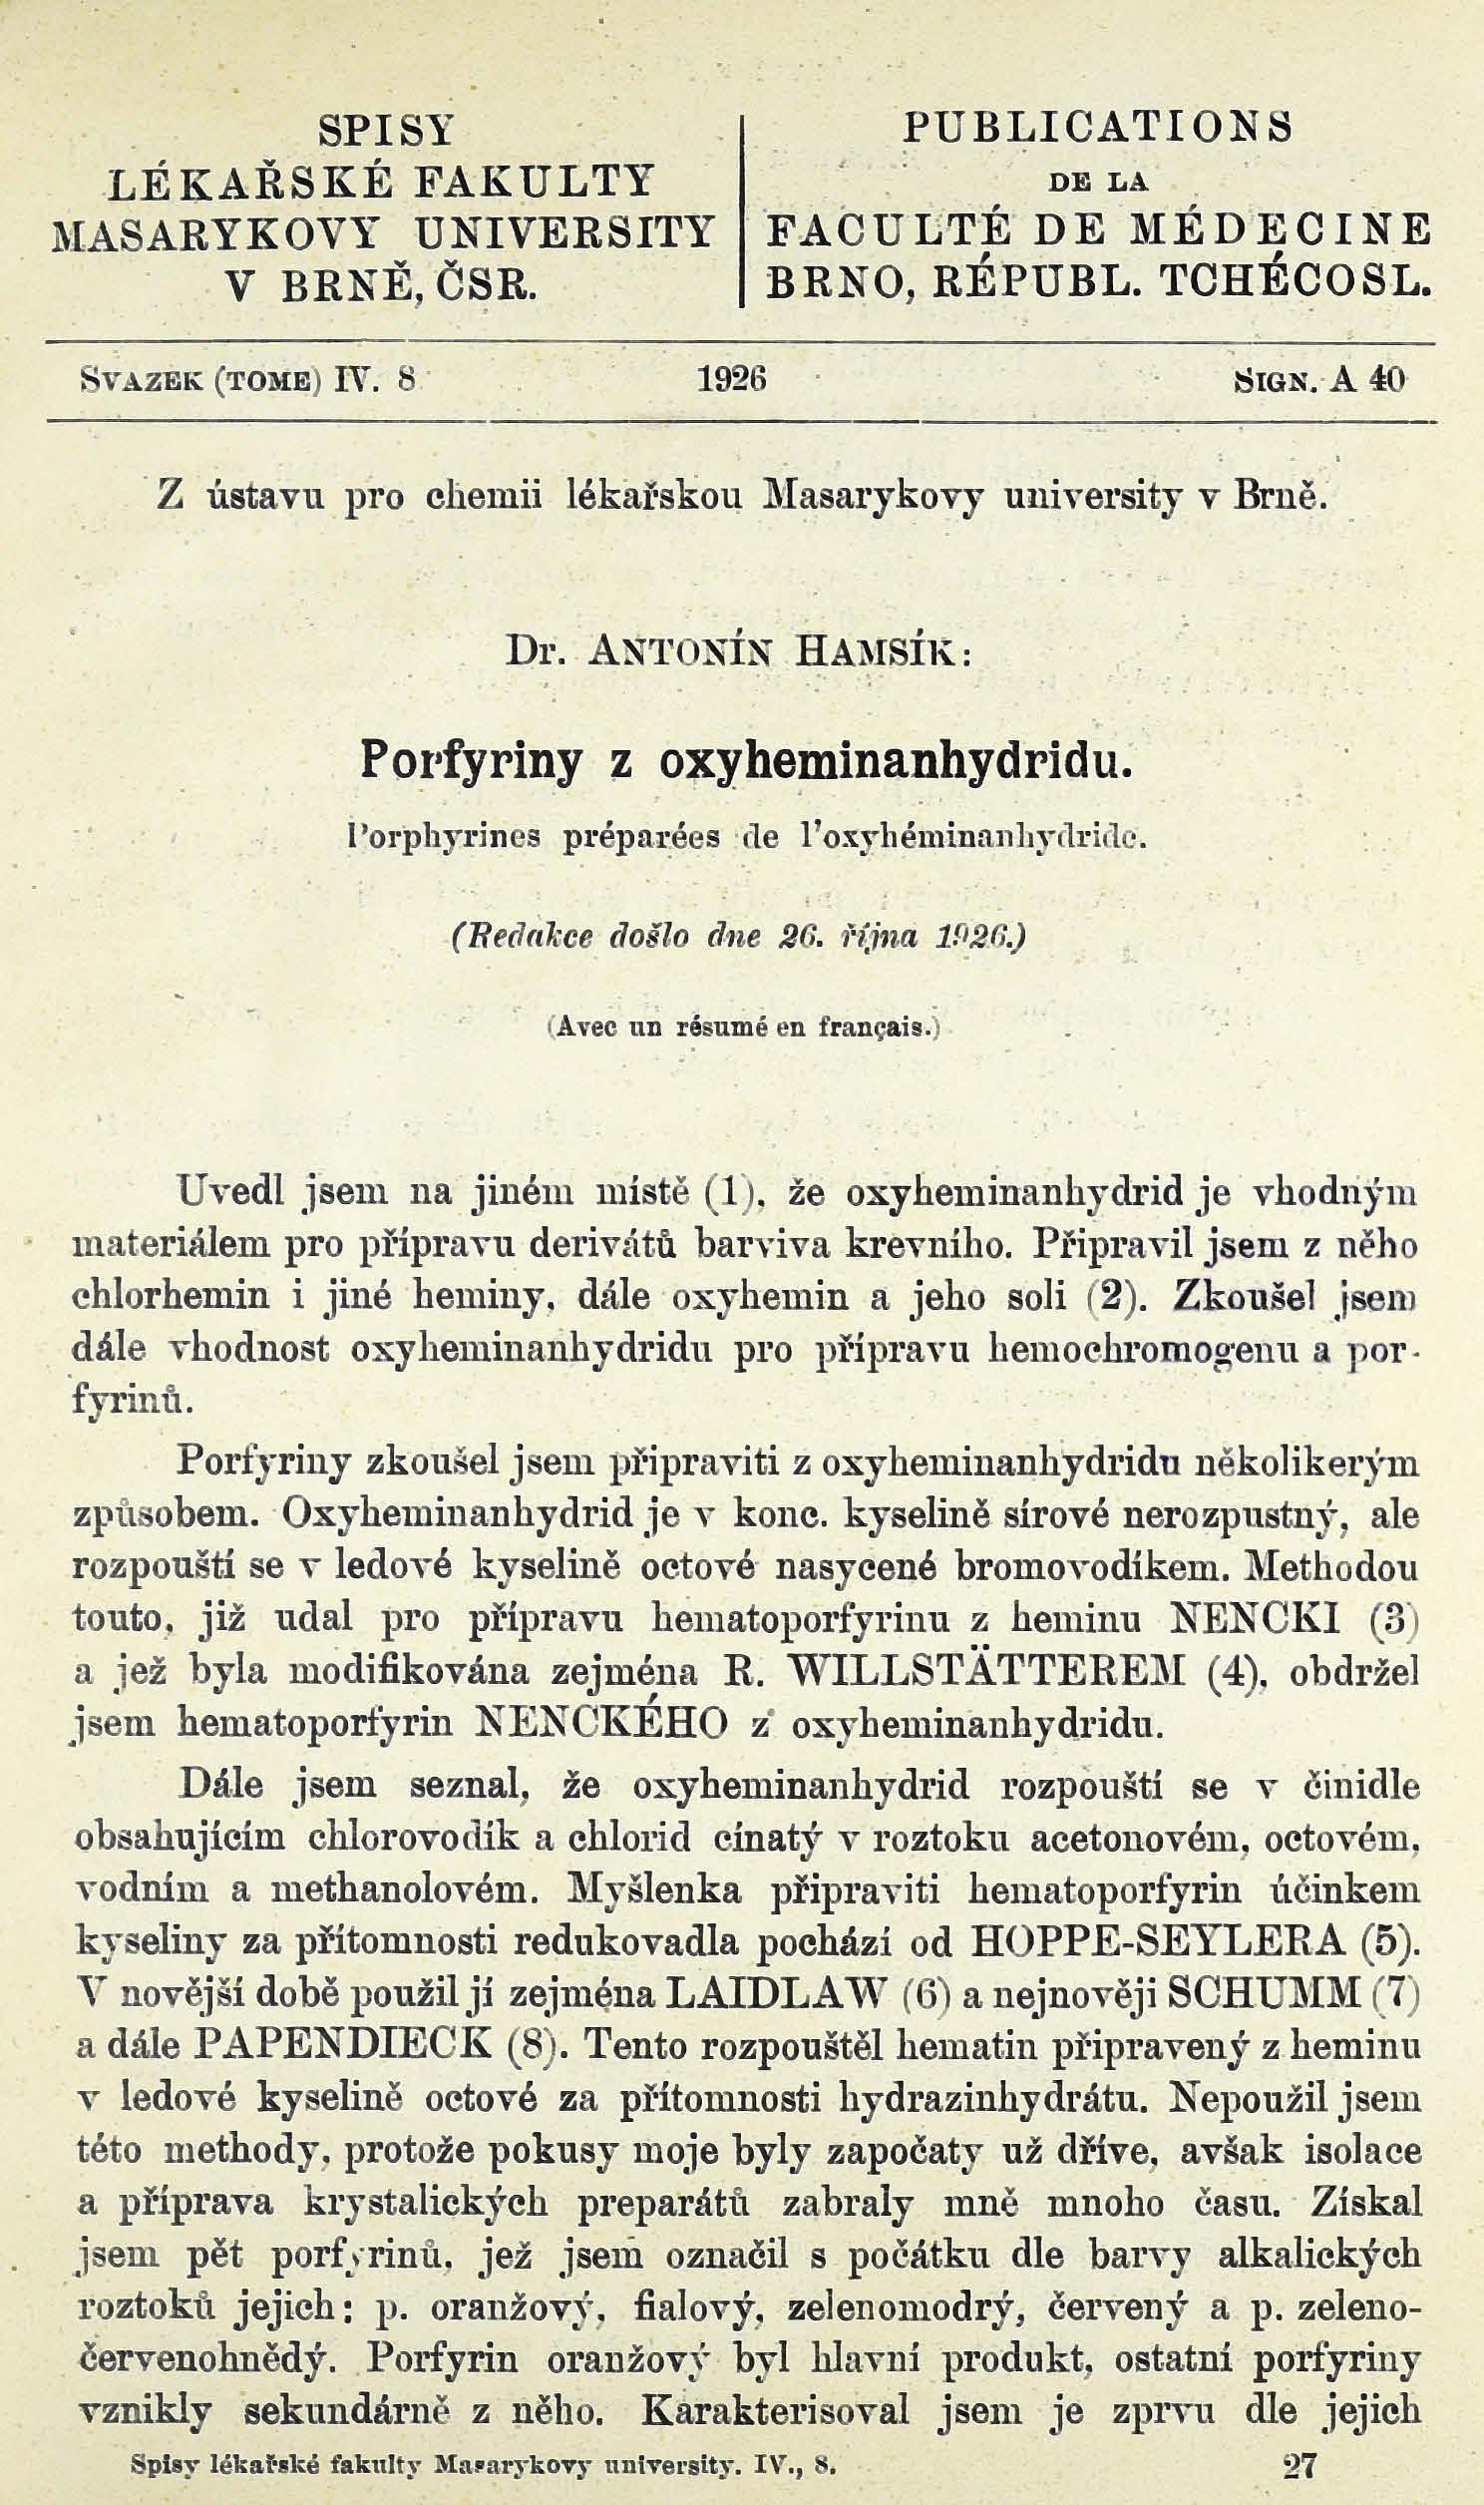 Obálka pro Porfyriny z oxyheminanhydridu / Porfhyrines préparées de l'oxyhéminanhydride